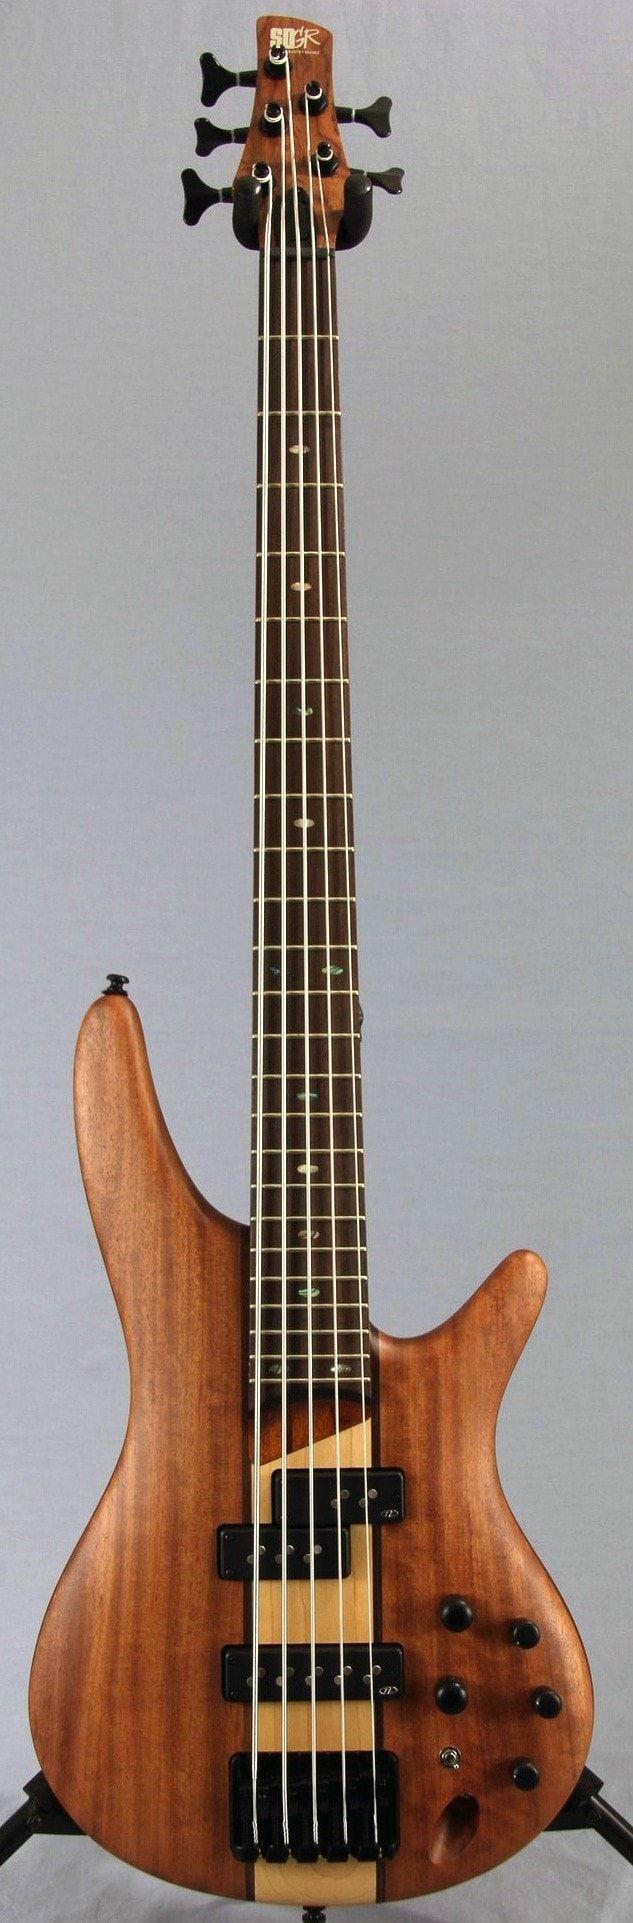 377 best Bass guitars I like images on Pinterest | Bass guitars ...